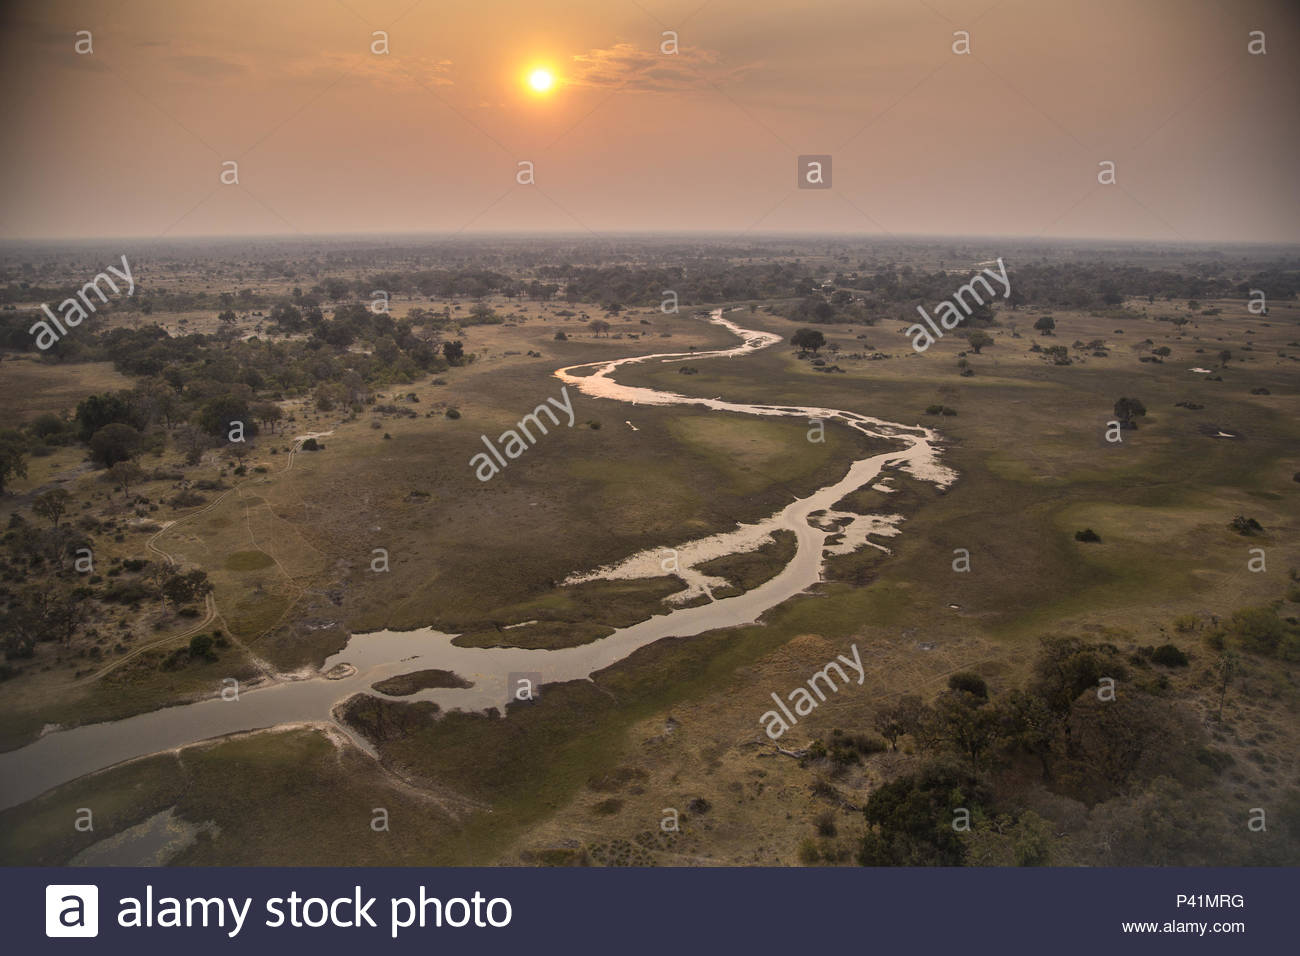 The Xigera concession area of Botswana's Okavango Delta. - Stock Image